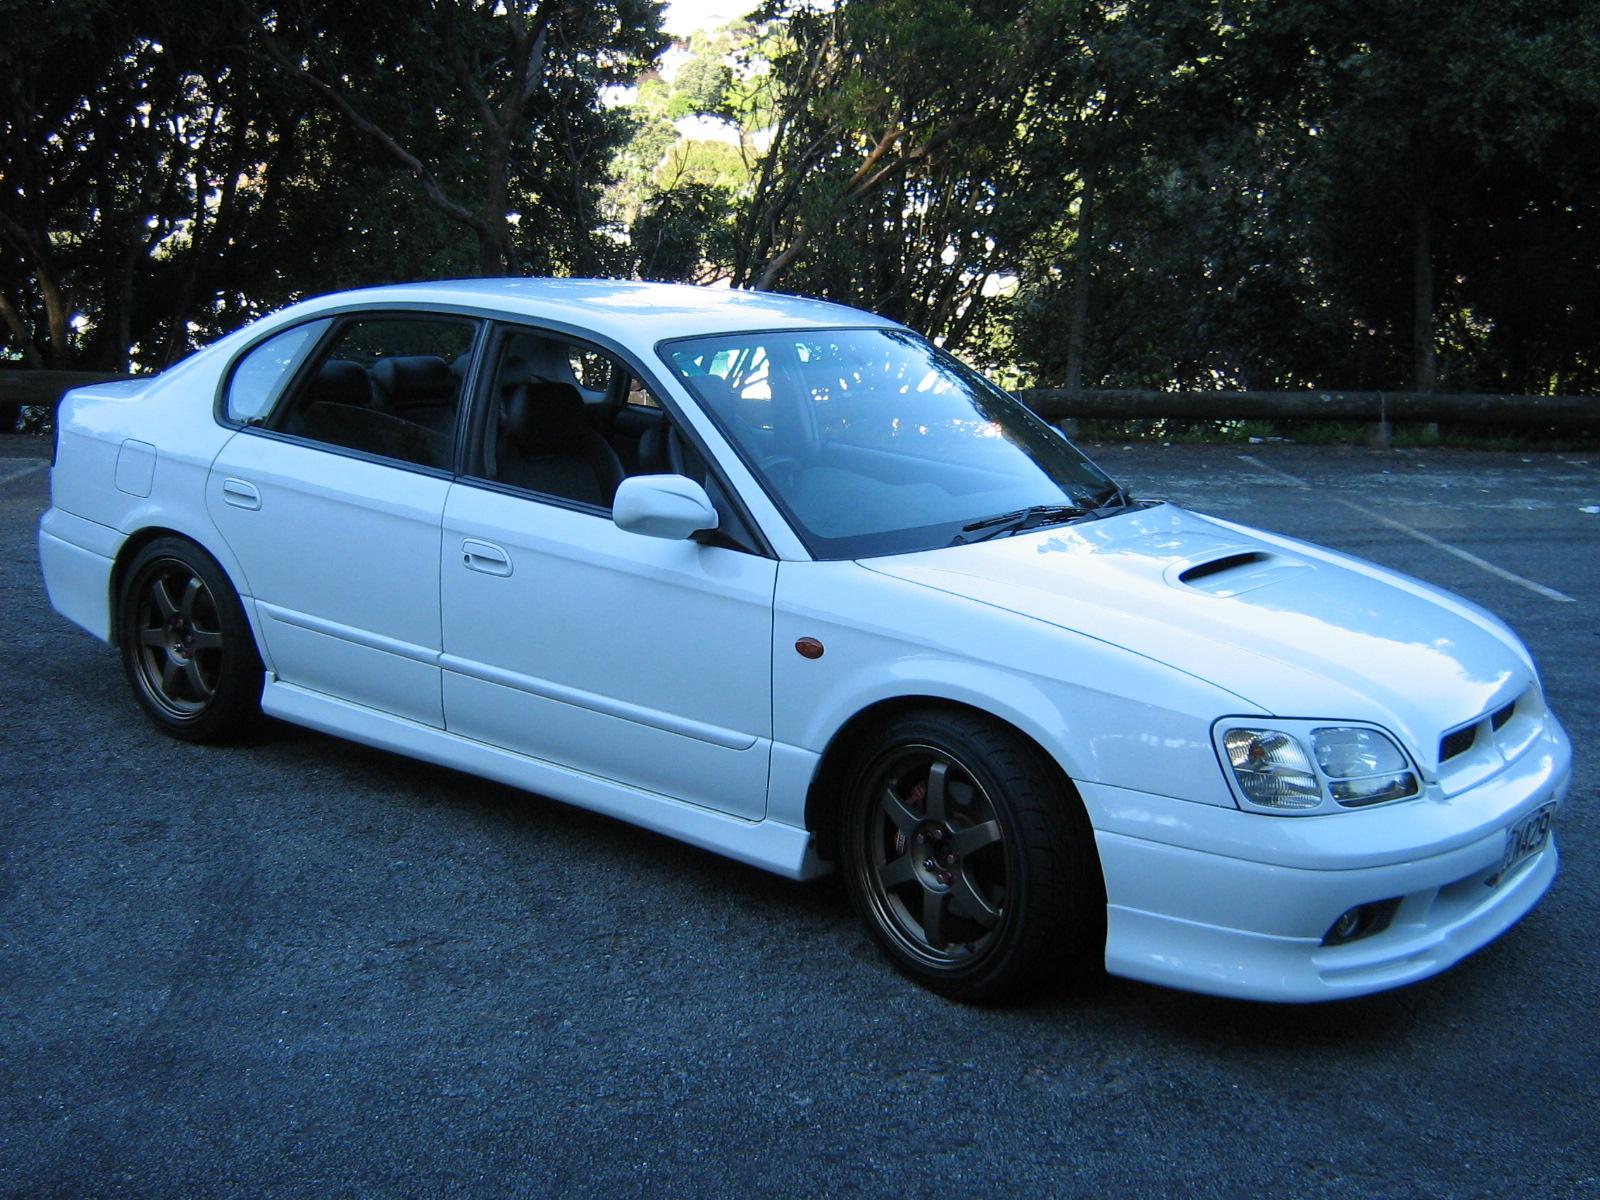 Picture of 1999 subaru legacy 4 dr gt awd sedan exterior